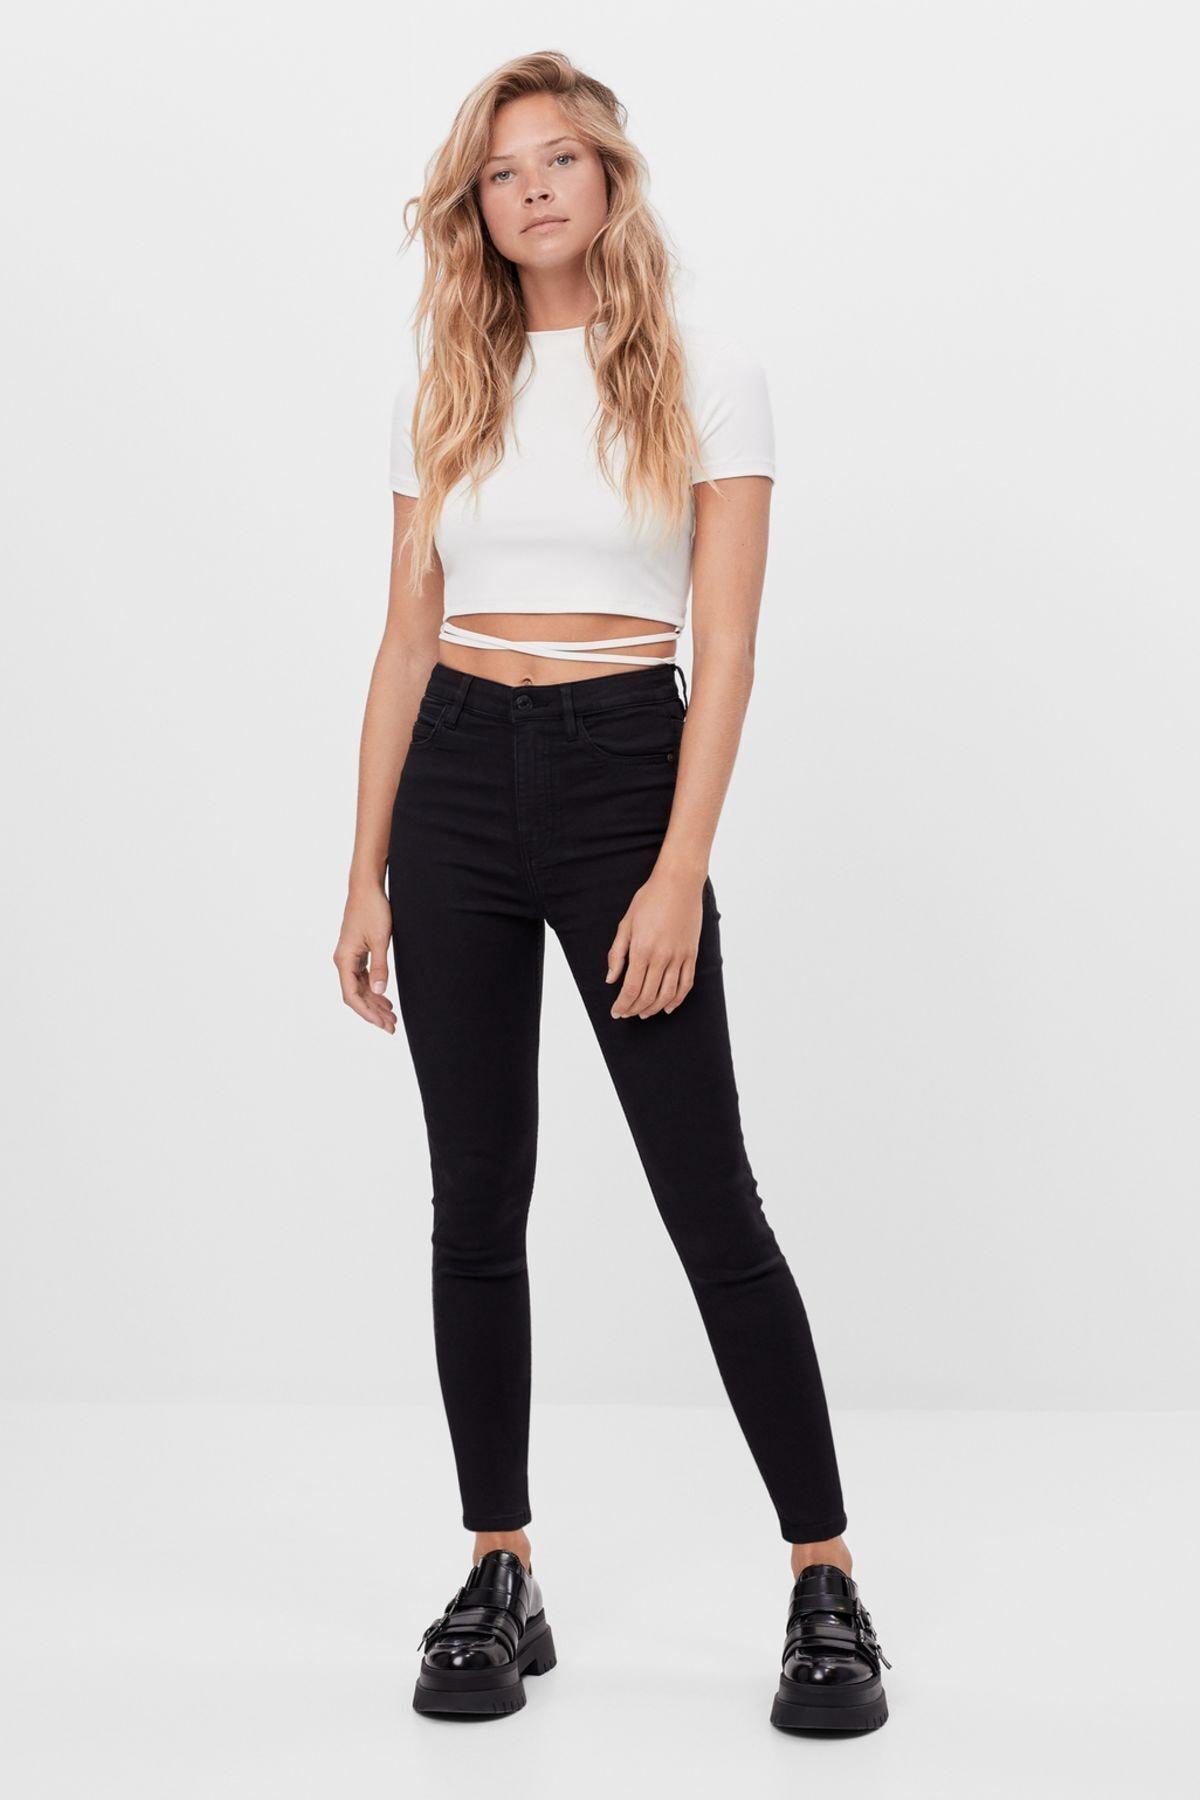 Bershka Kadın Siyah Süper Yüksek Bel Pantolon 1